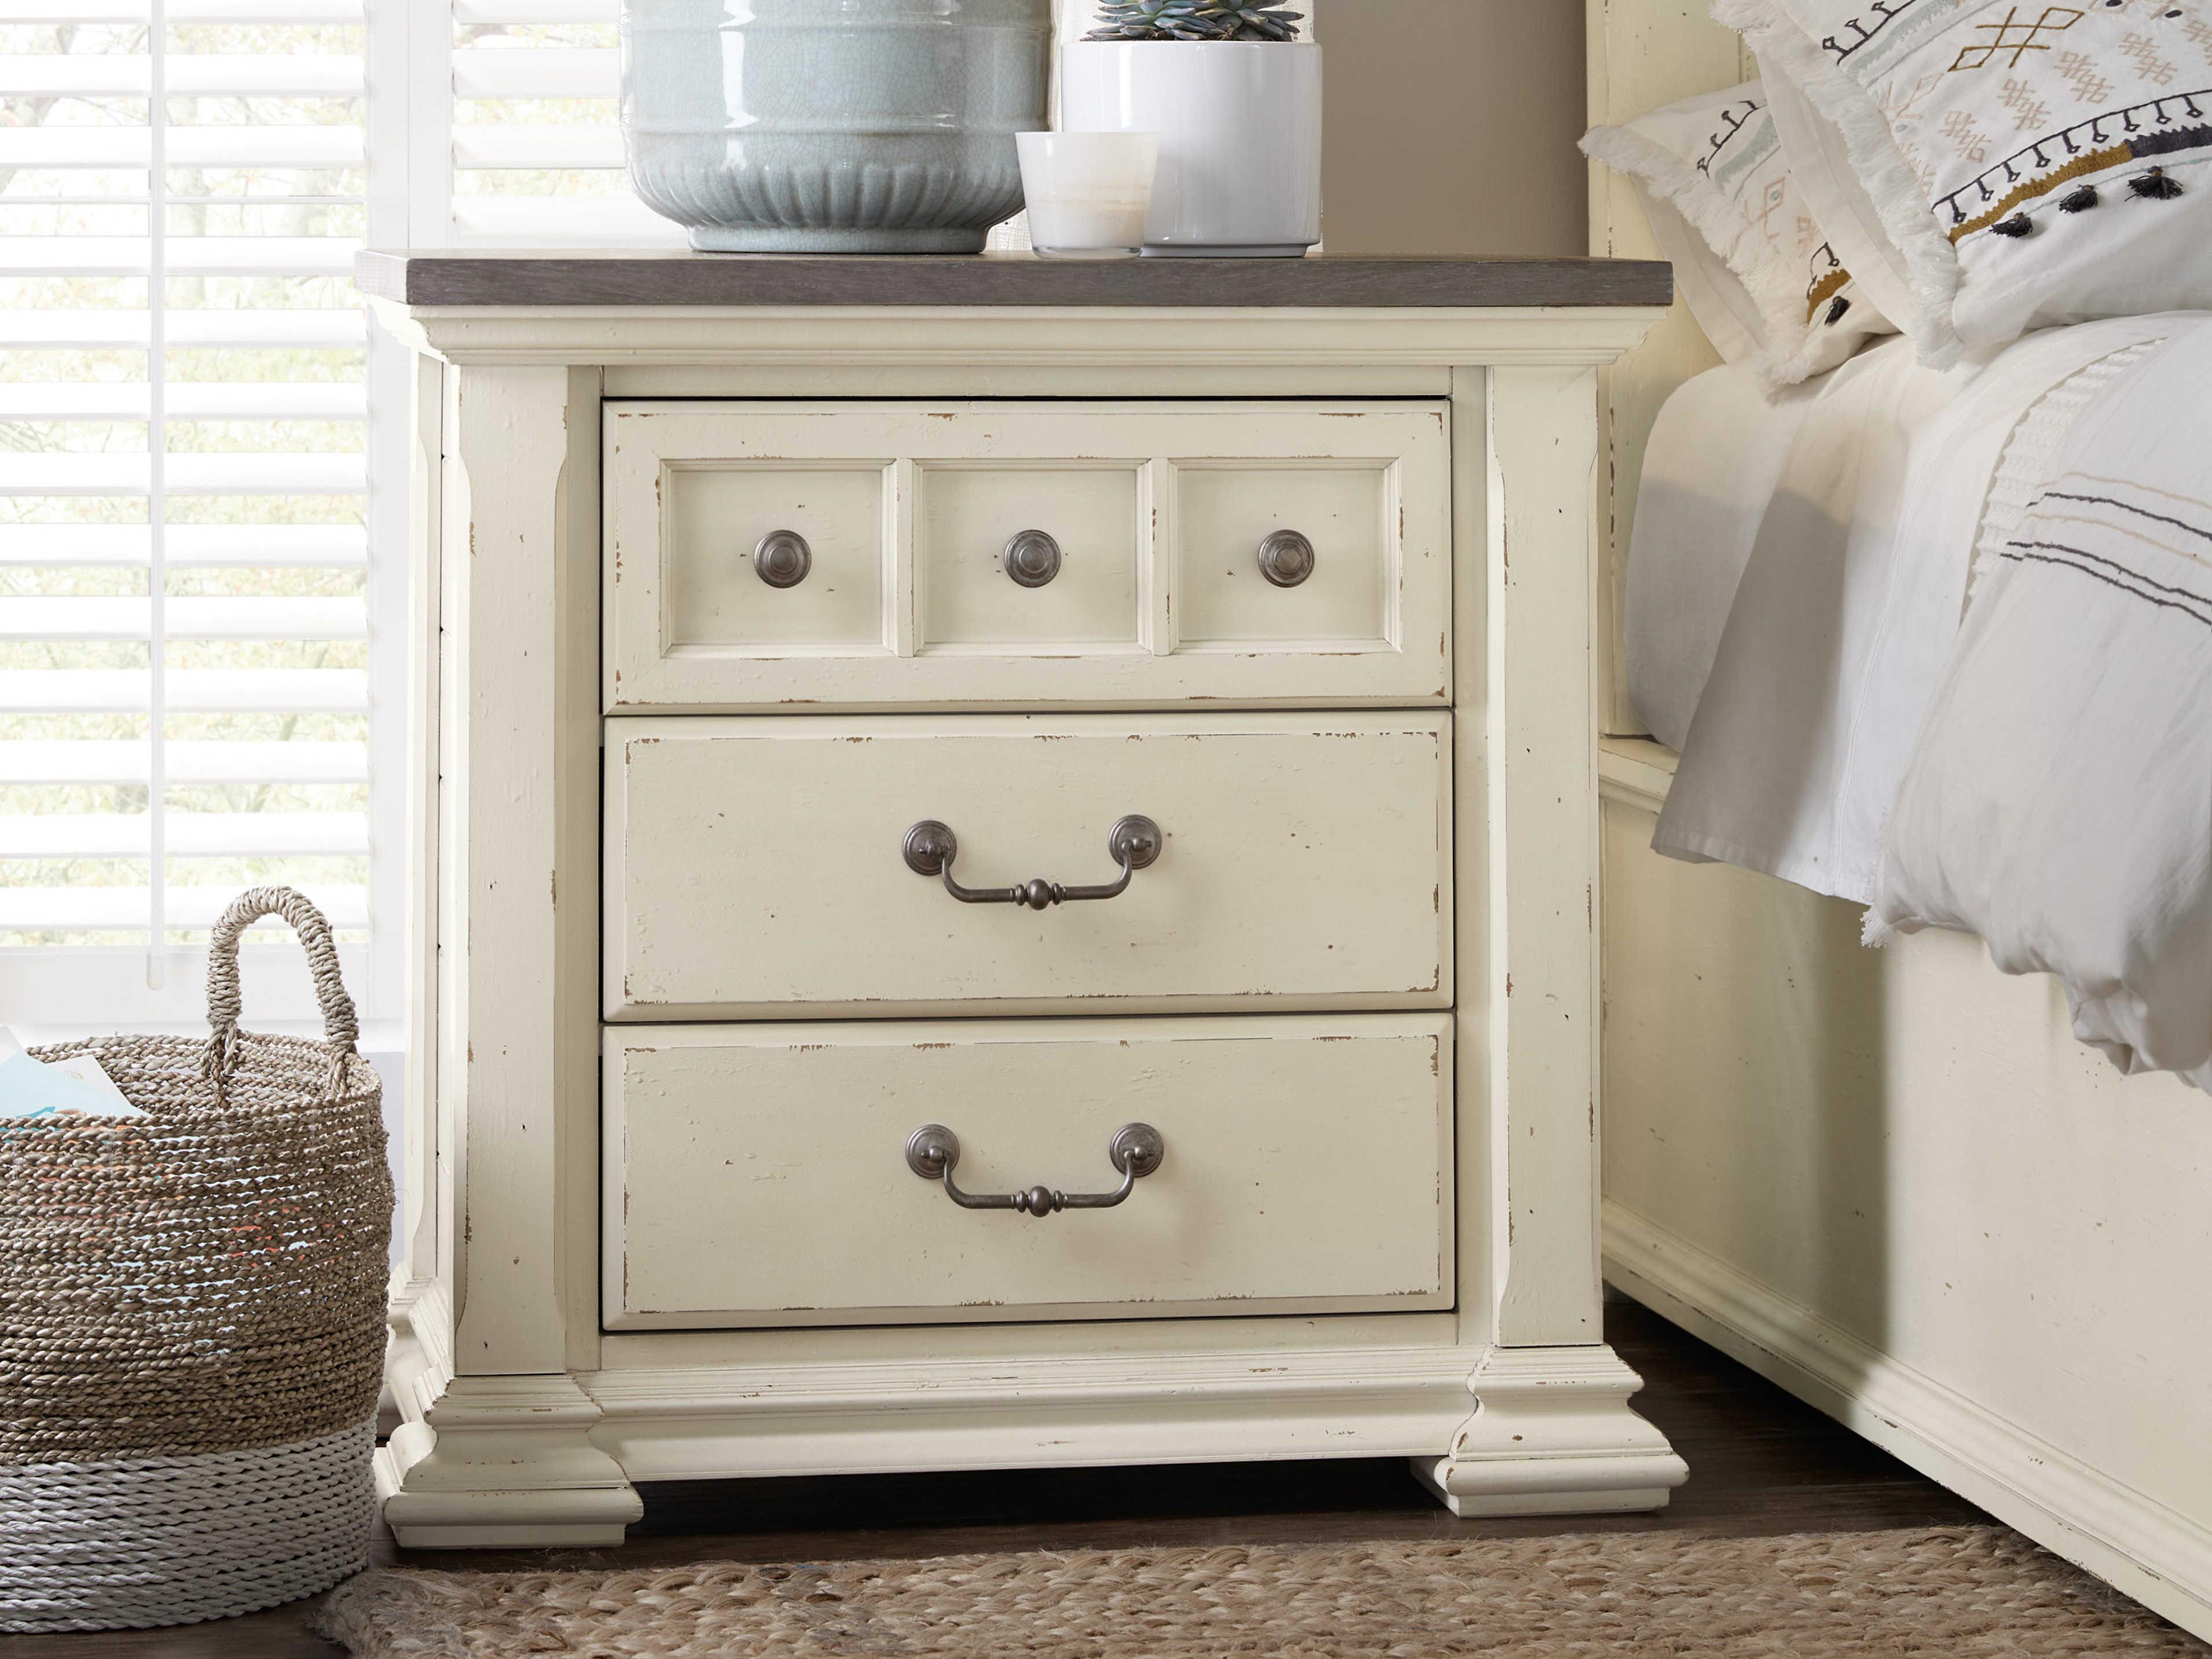 Hooker Furniture Sturbridge Distressed Cream With Grey 31 W X 17 D Rectangular Nightstand